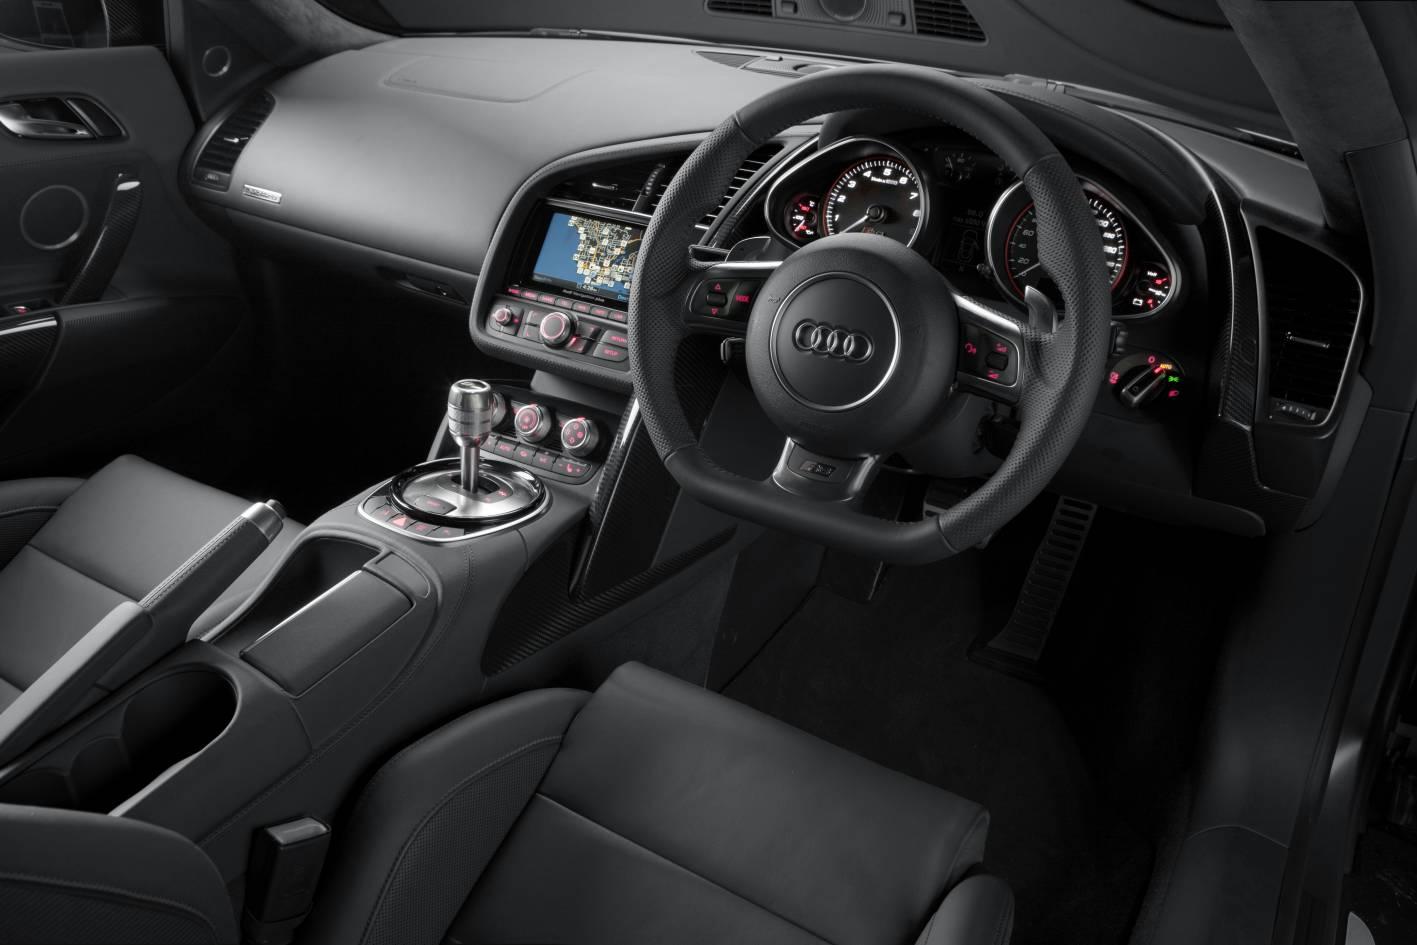 Audi Cars - News: 2013 Audi R8 V10 plus joins local range